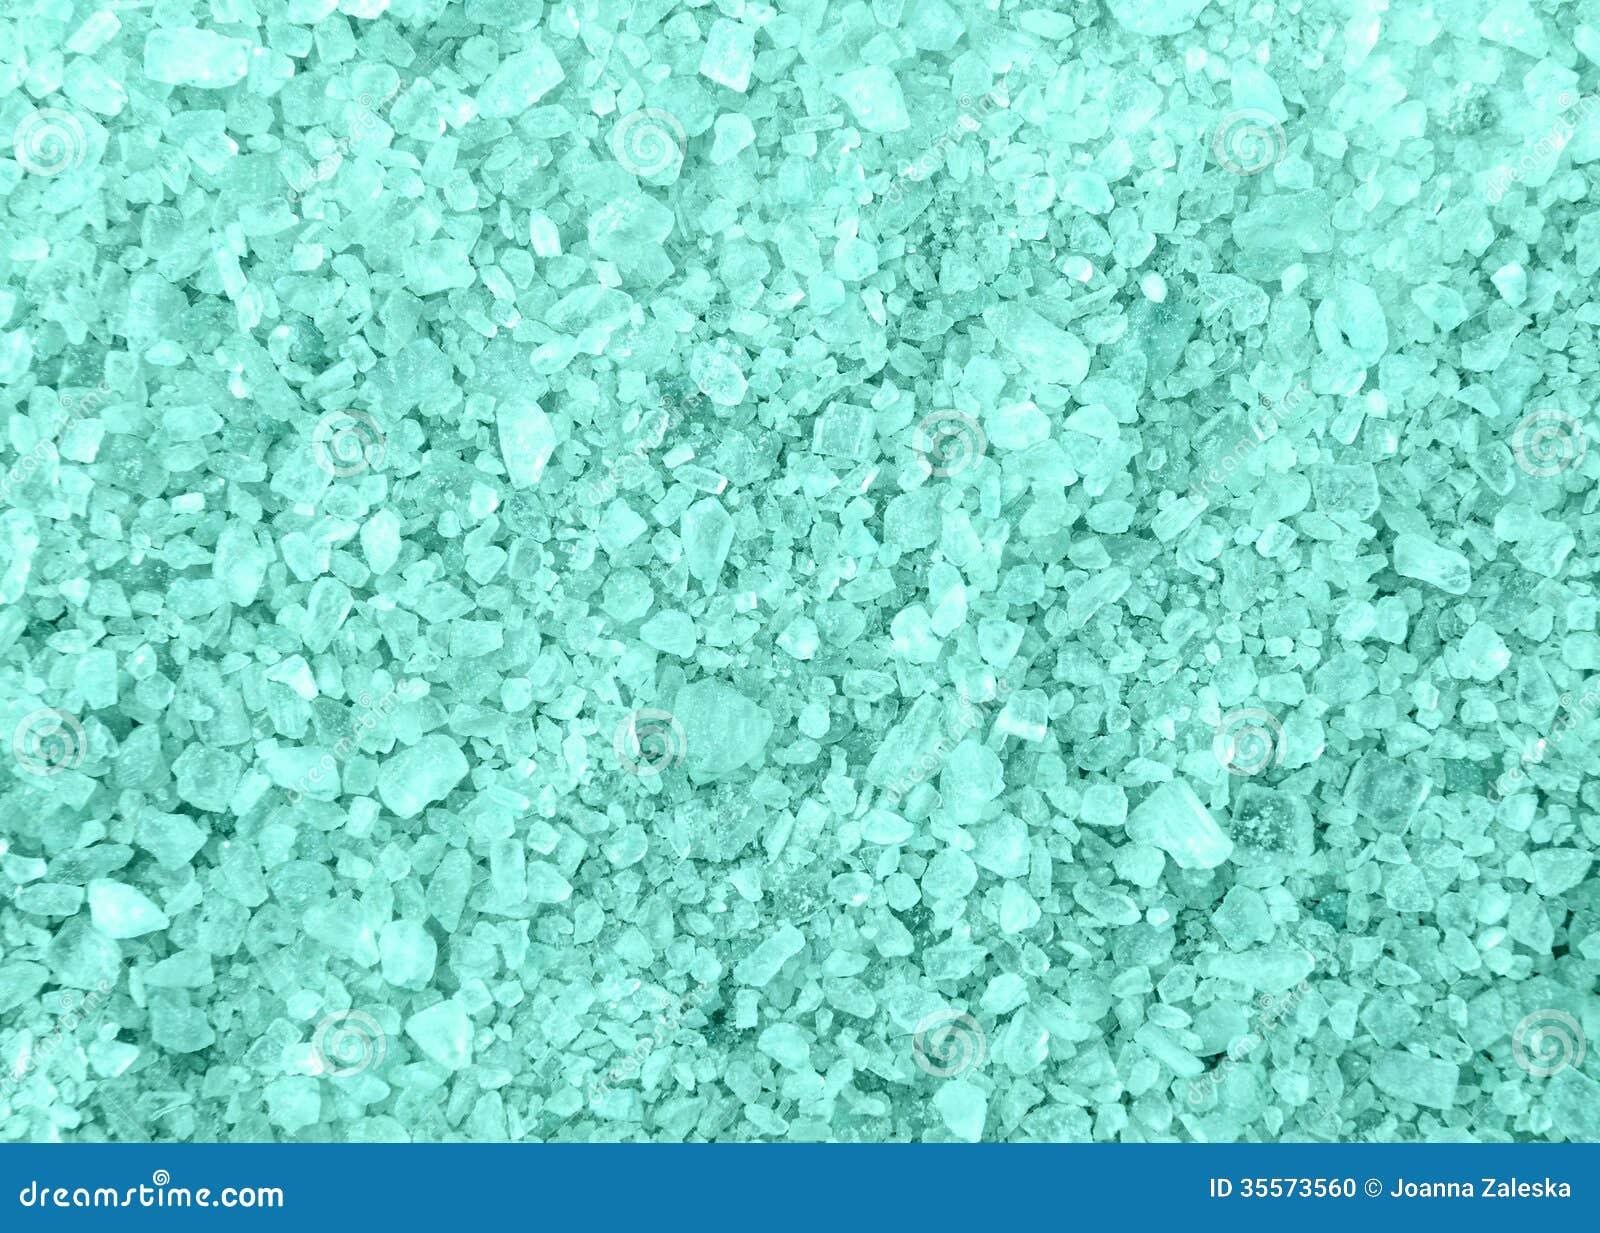 spa blue bath salt crystals background texture stock photo